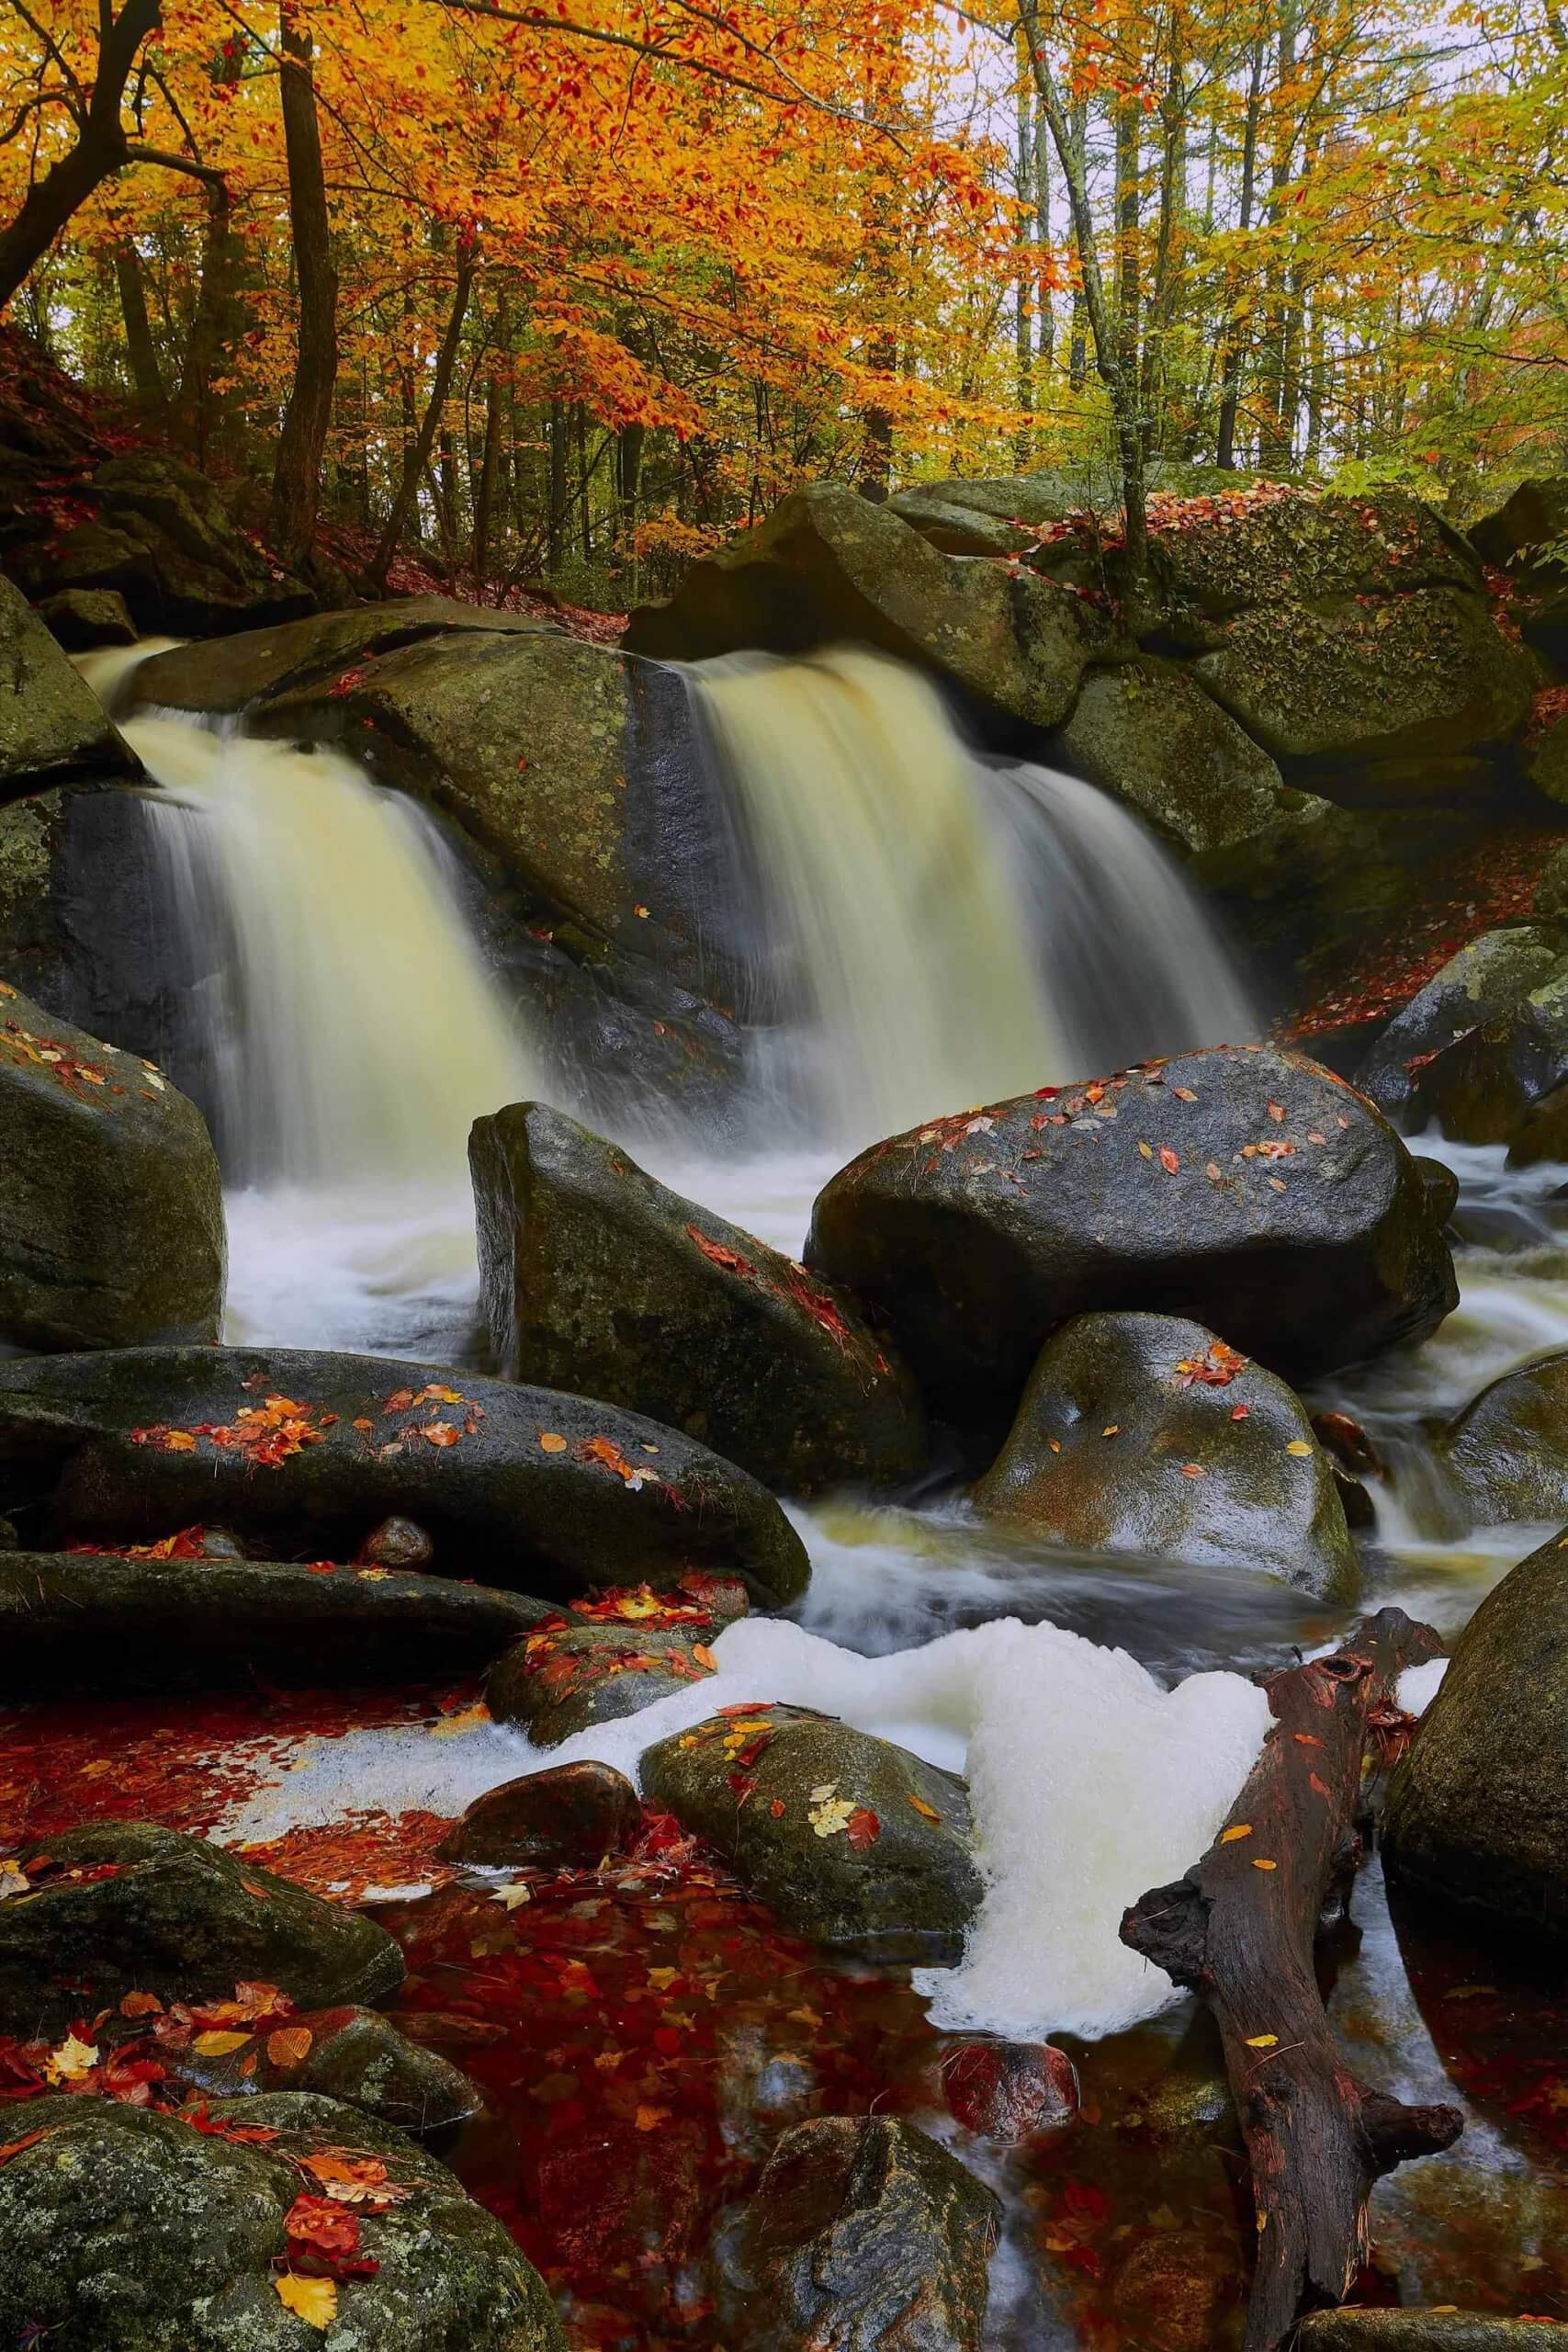 The Silent Stream